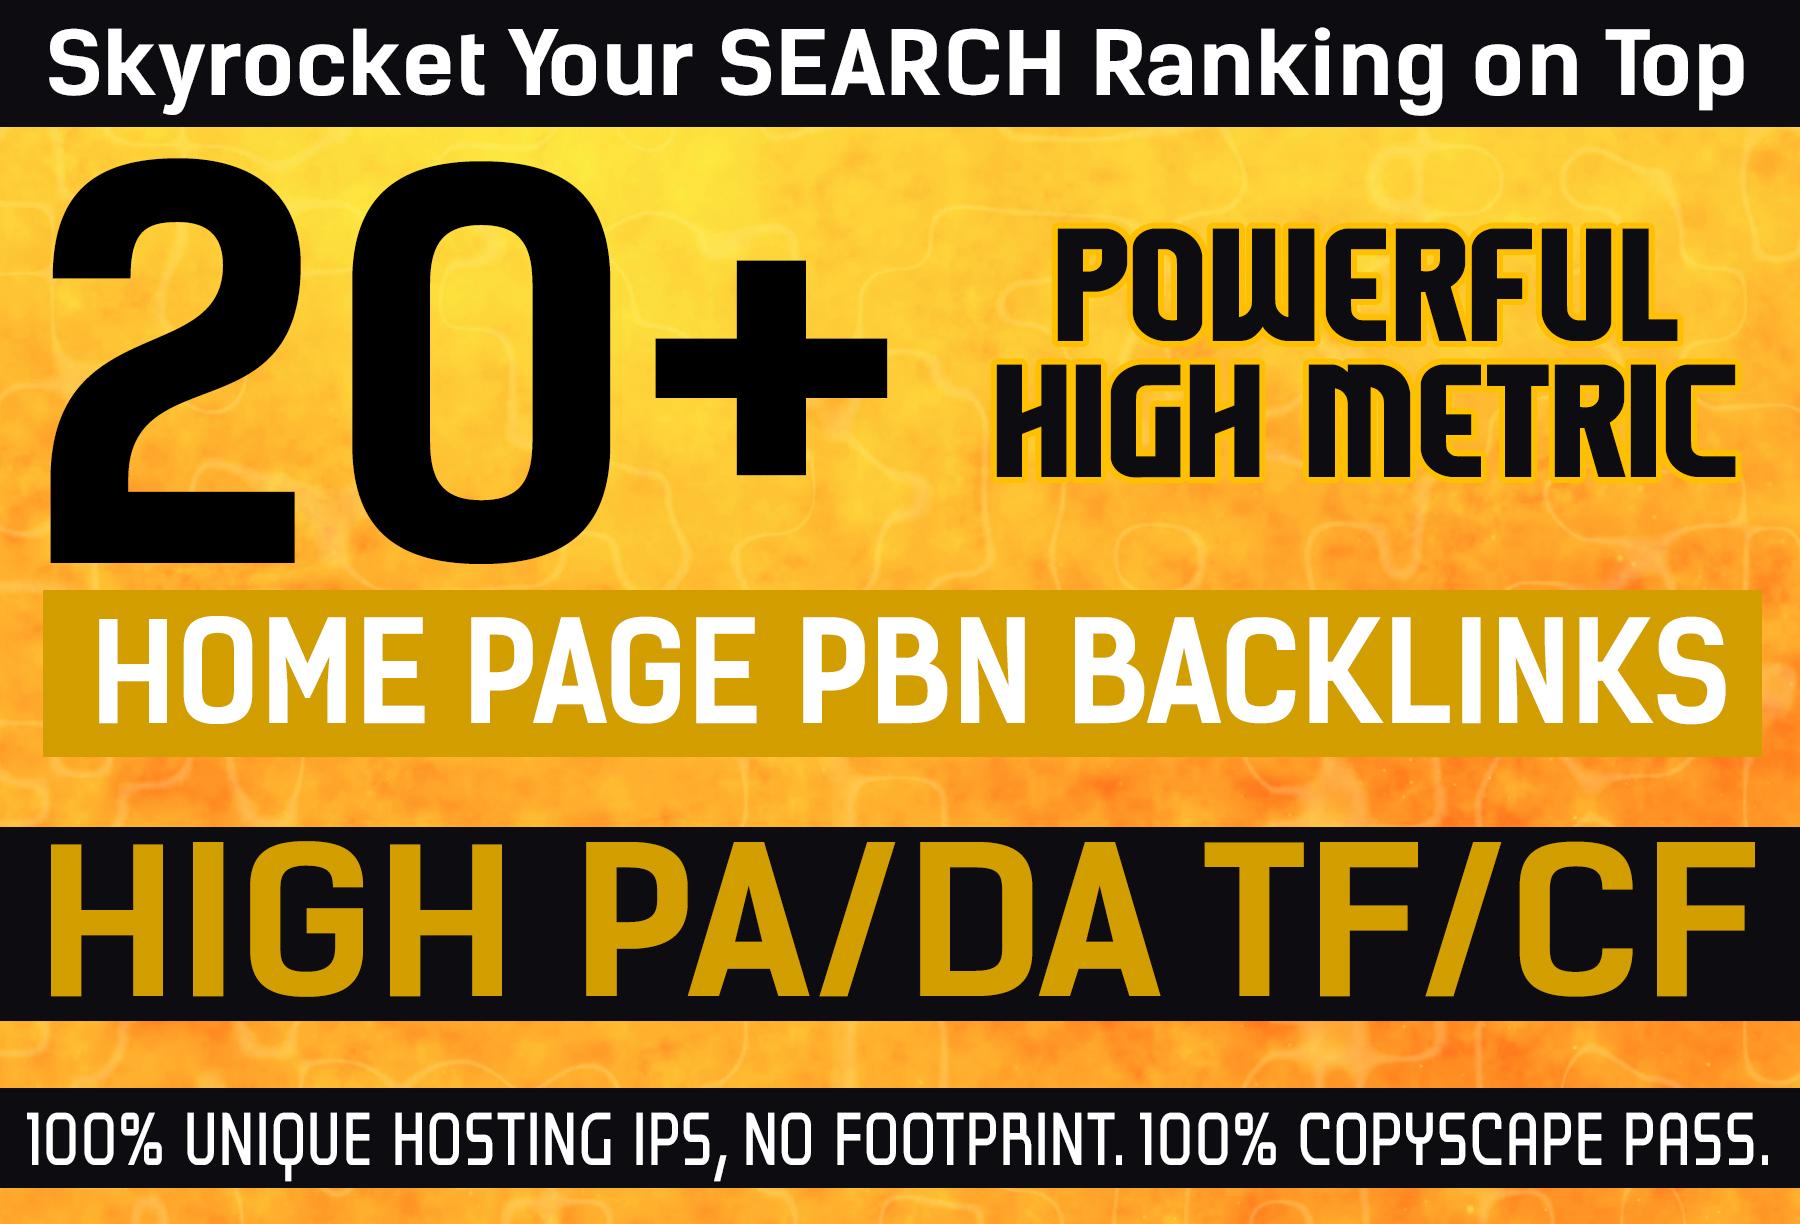 I will create 20 Extreamly powerful homepage pbn backlinks